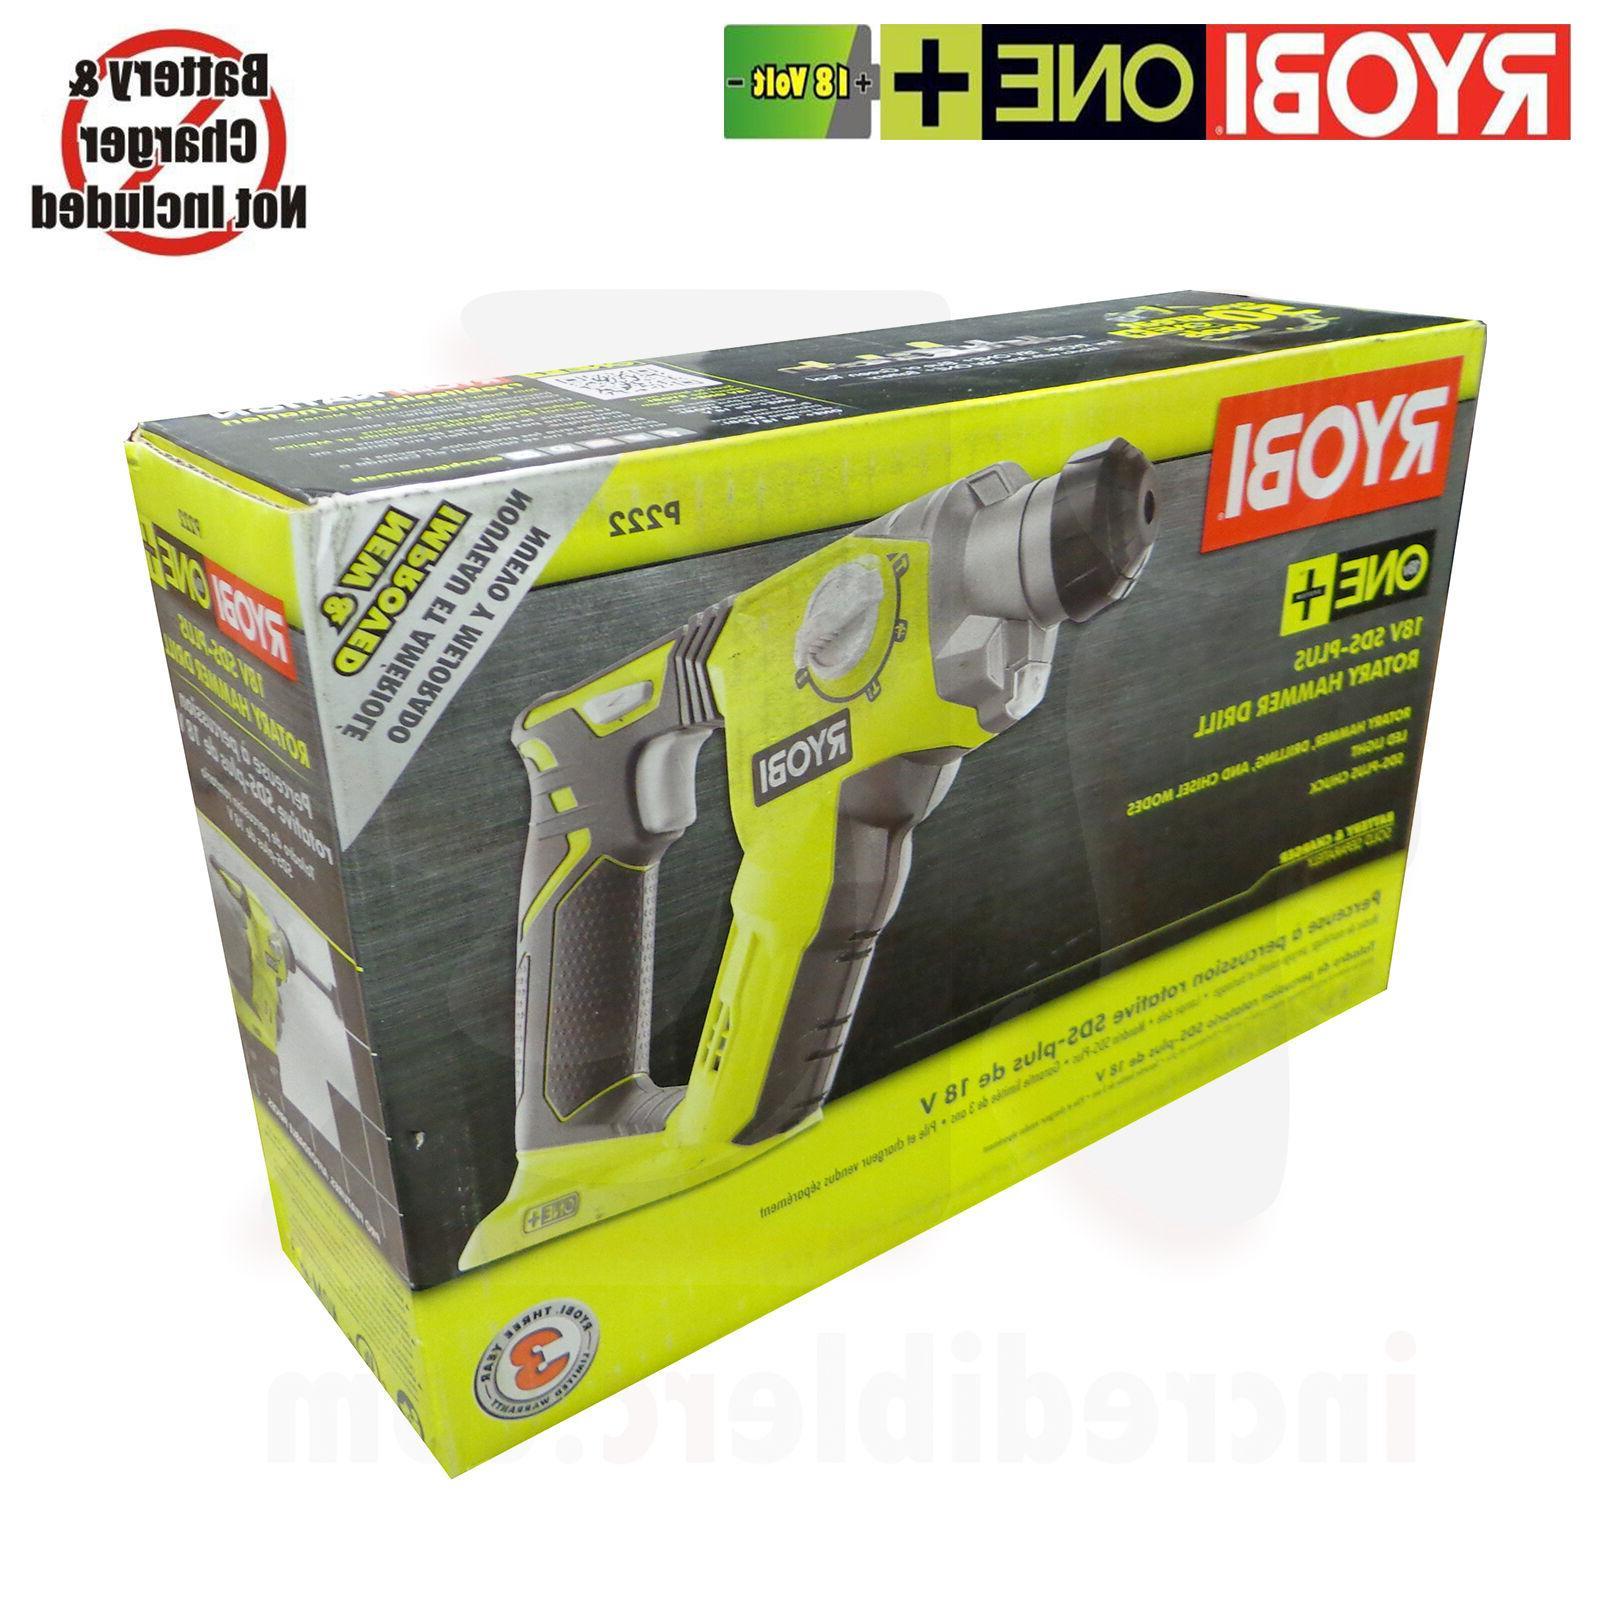 p222 one sds rotary hammer